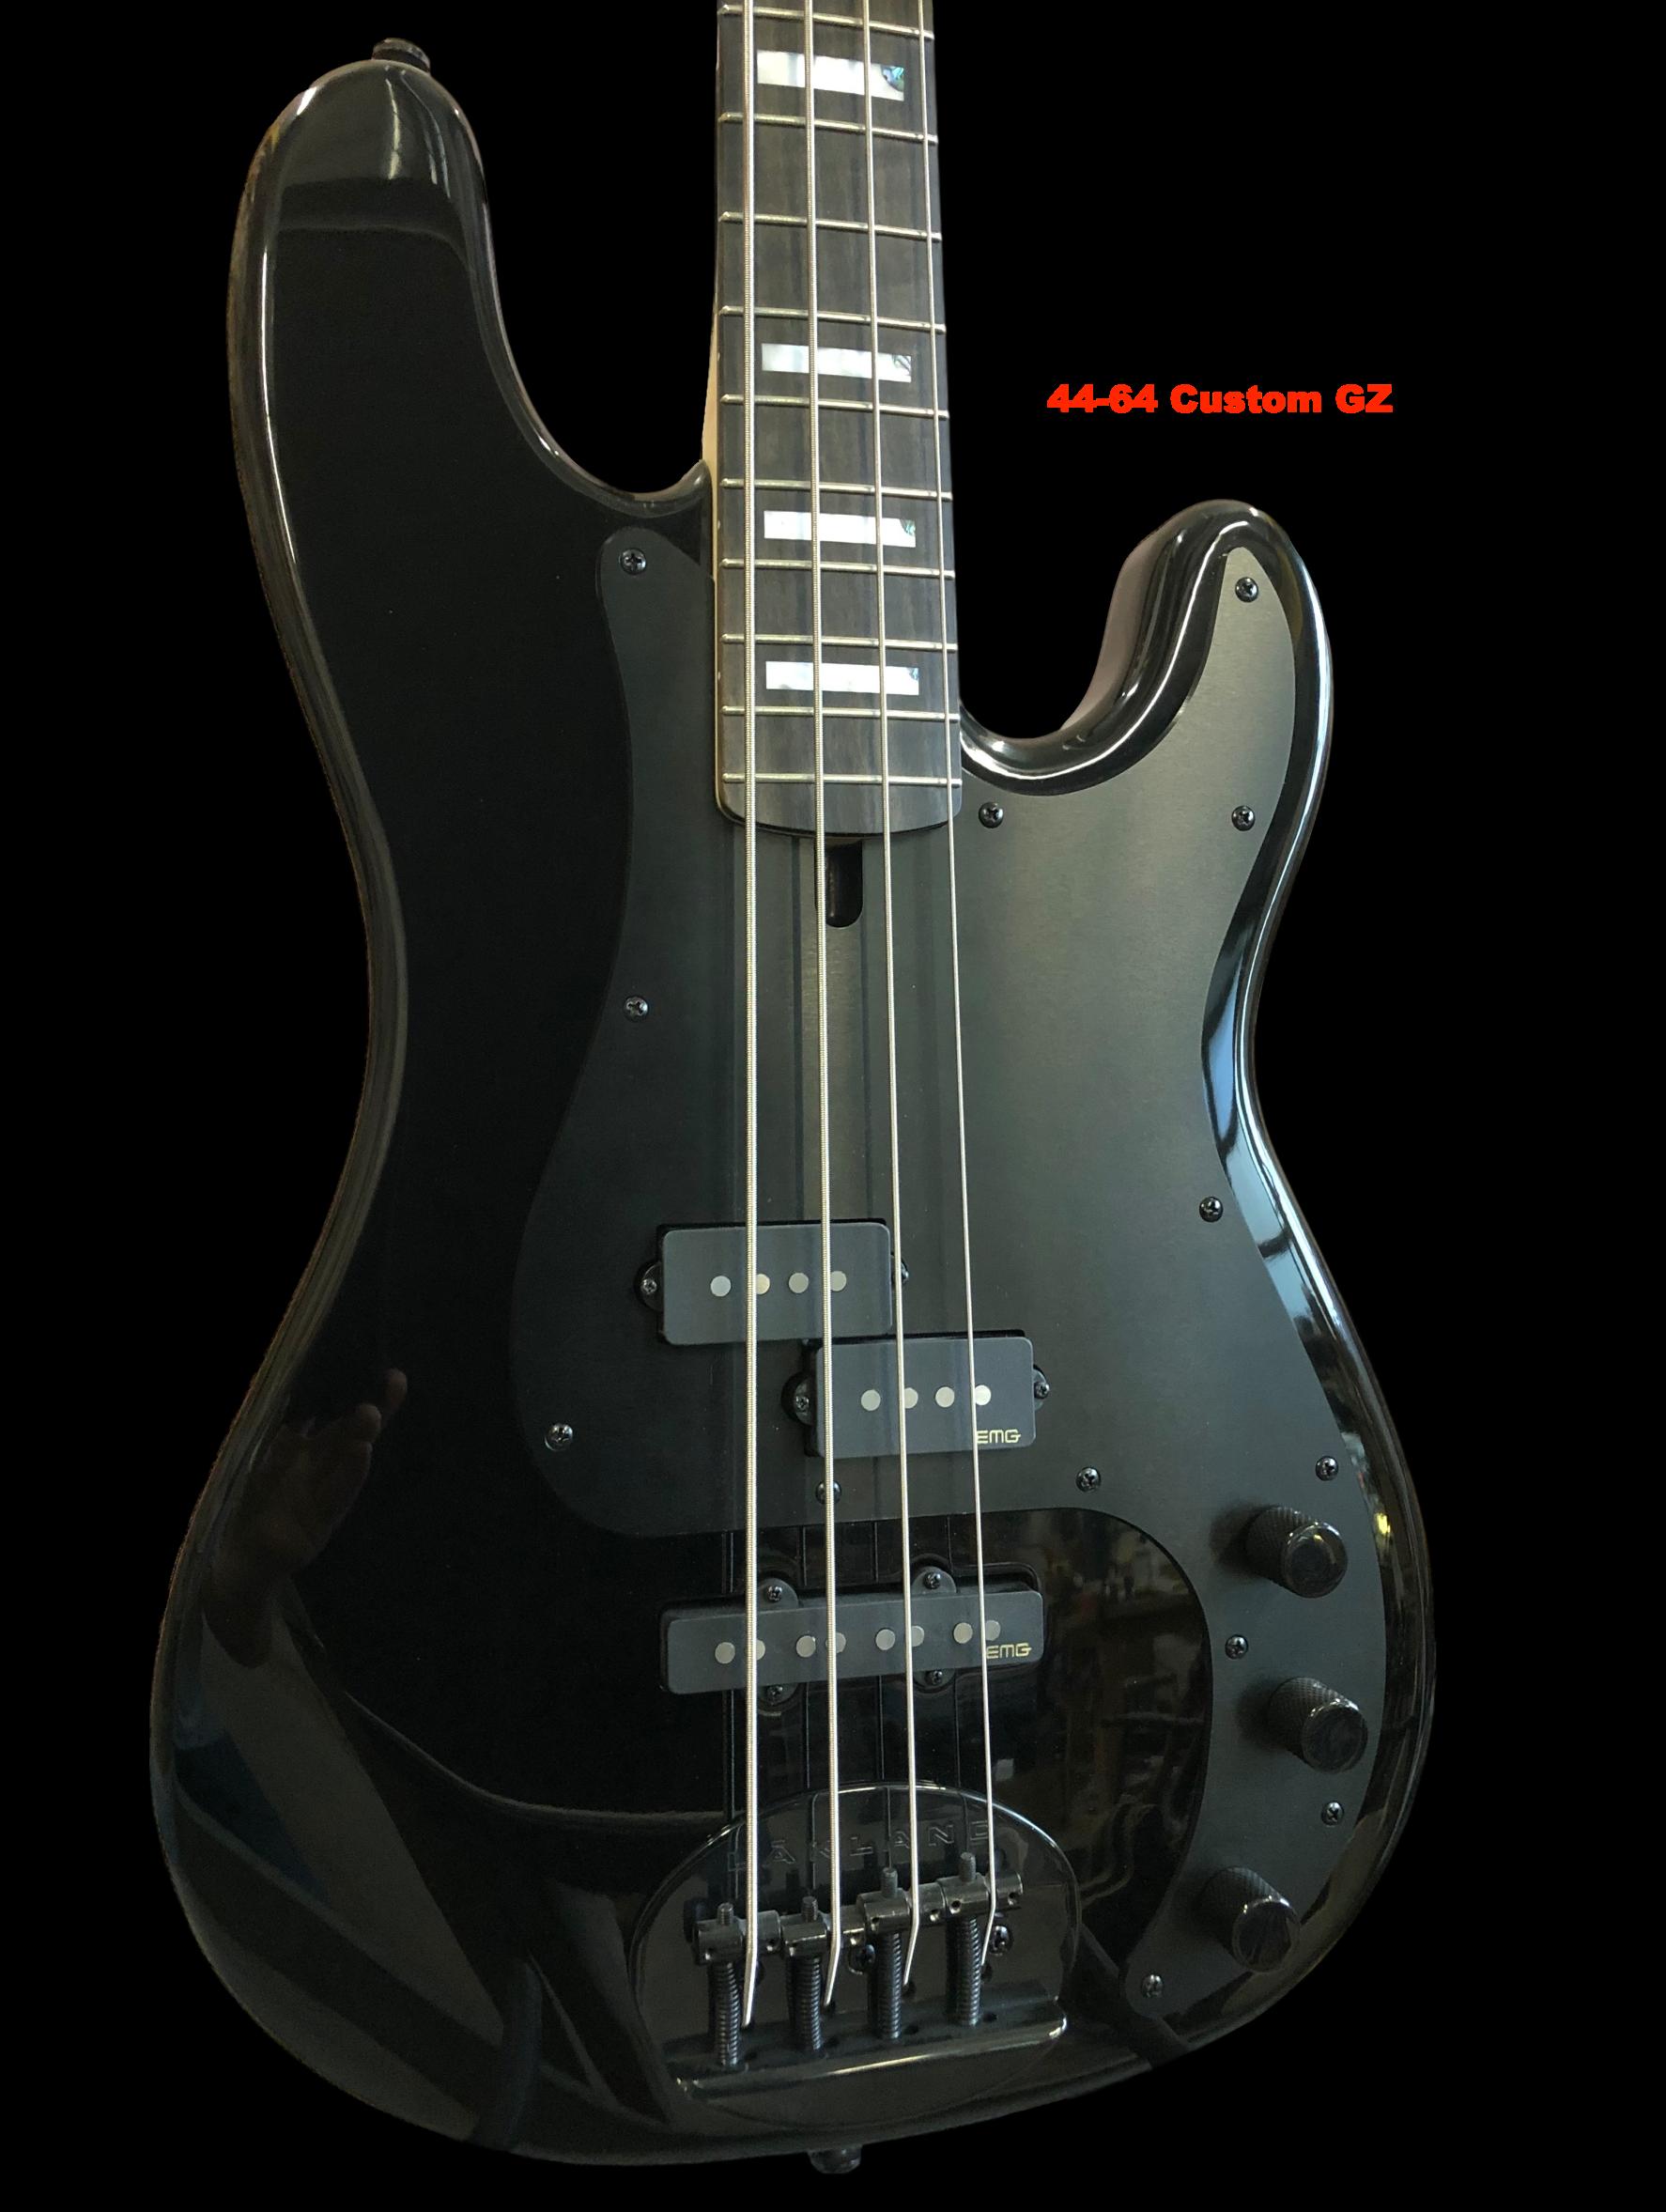 Skyline Series 44-64 (Custom PJ)